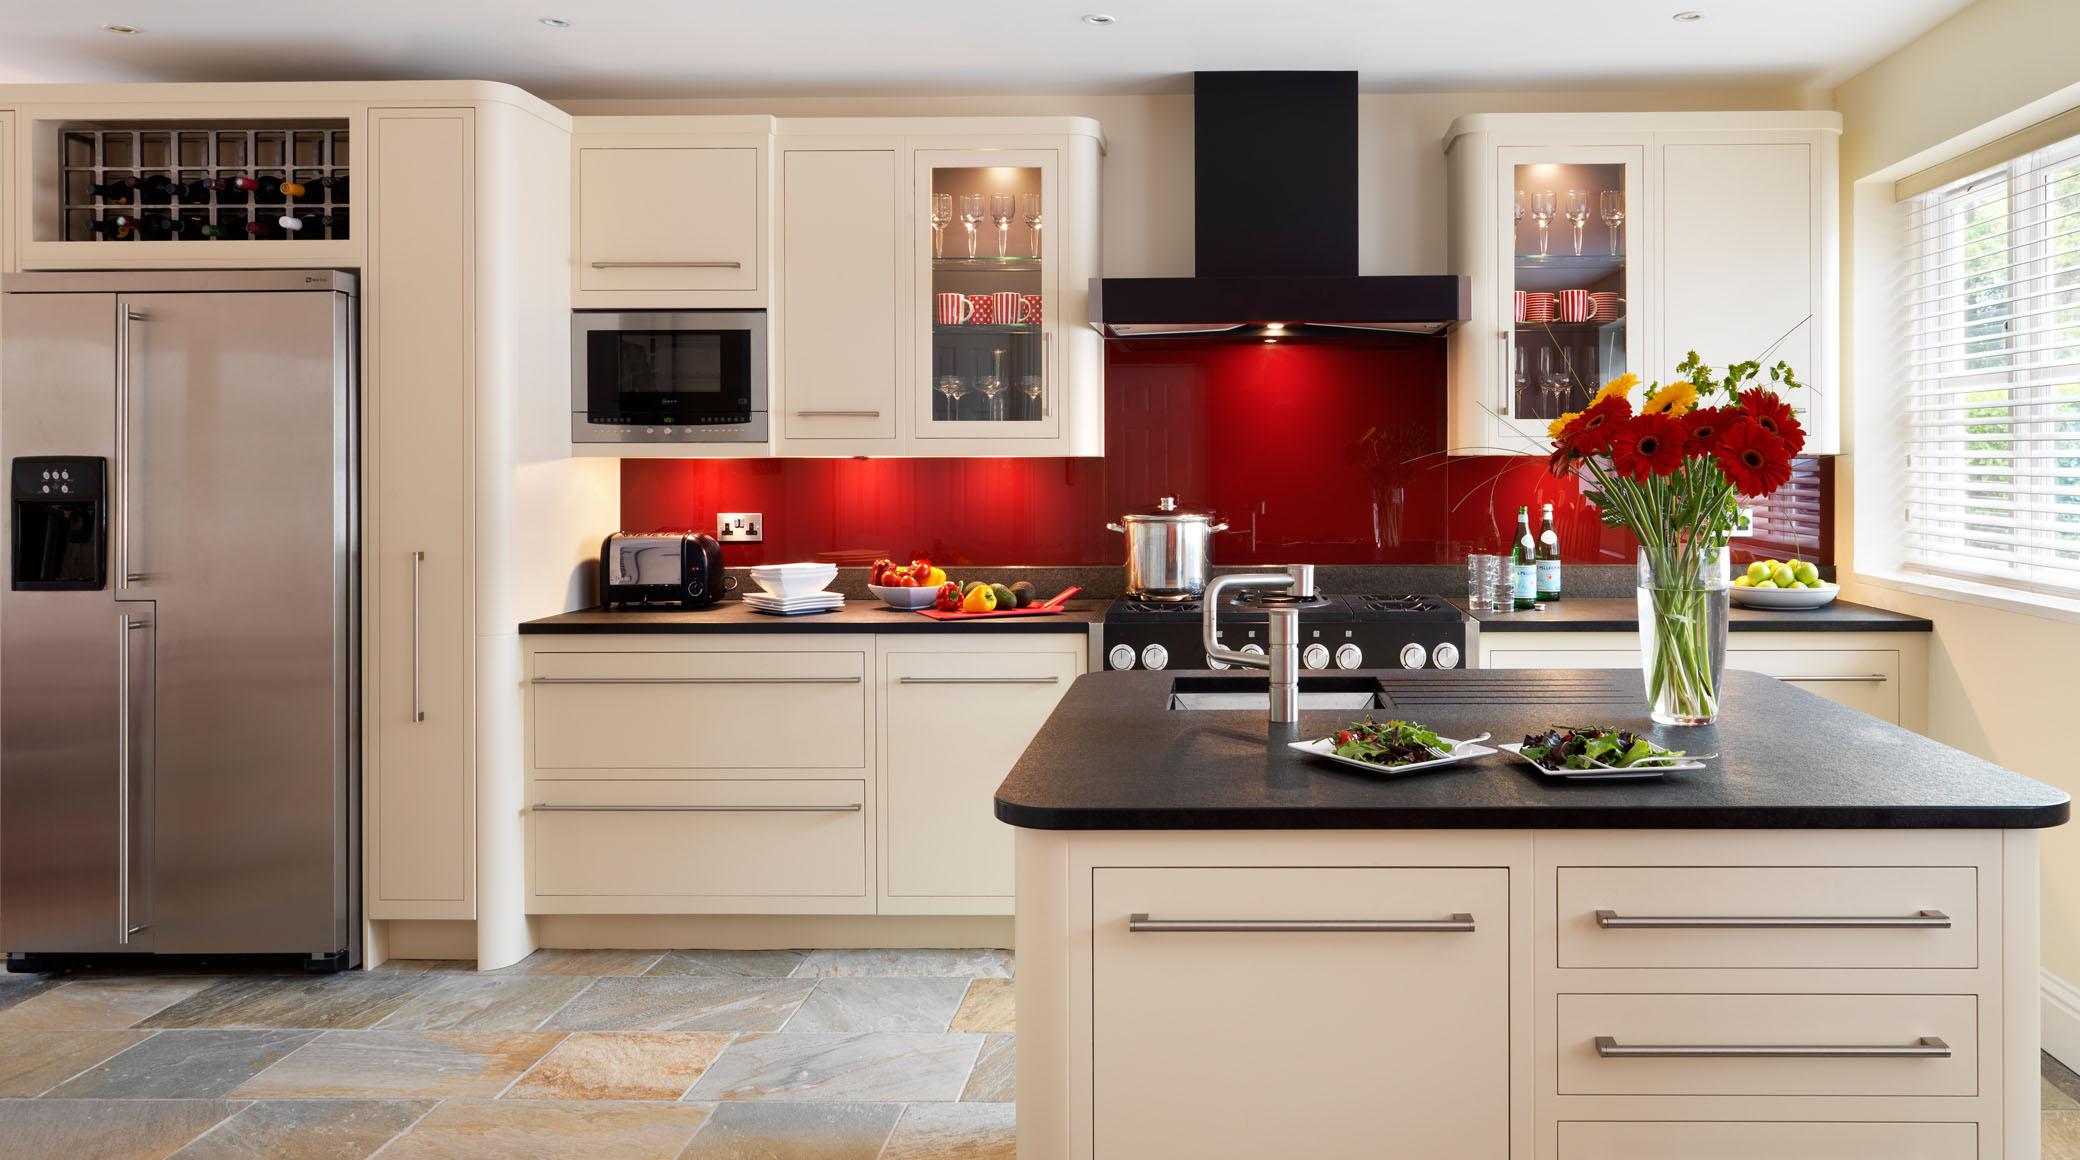 Linear Kitchen With Red Glass Splashback Gallery Kitchen Splashback Red Kitchen Decor Tuscan Kitchen